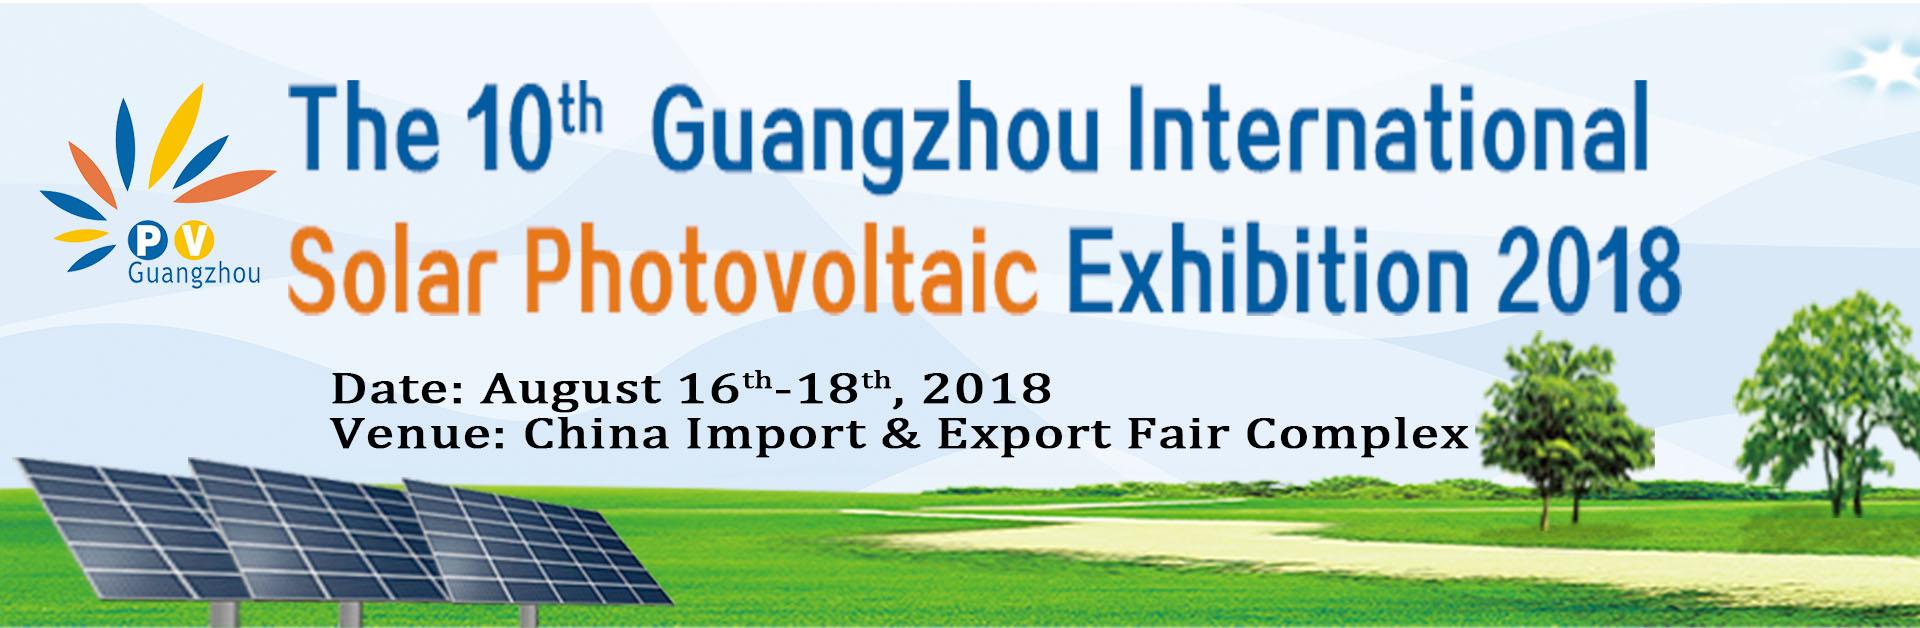 Guangzhou International Solar Photovoltaic Exhibition | The